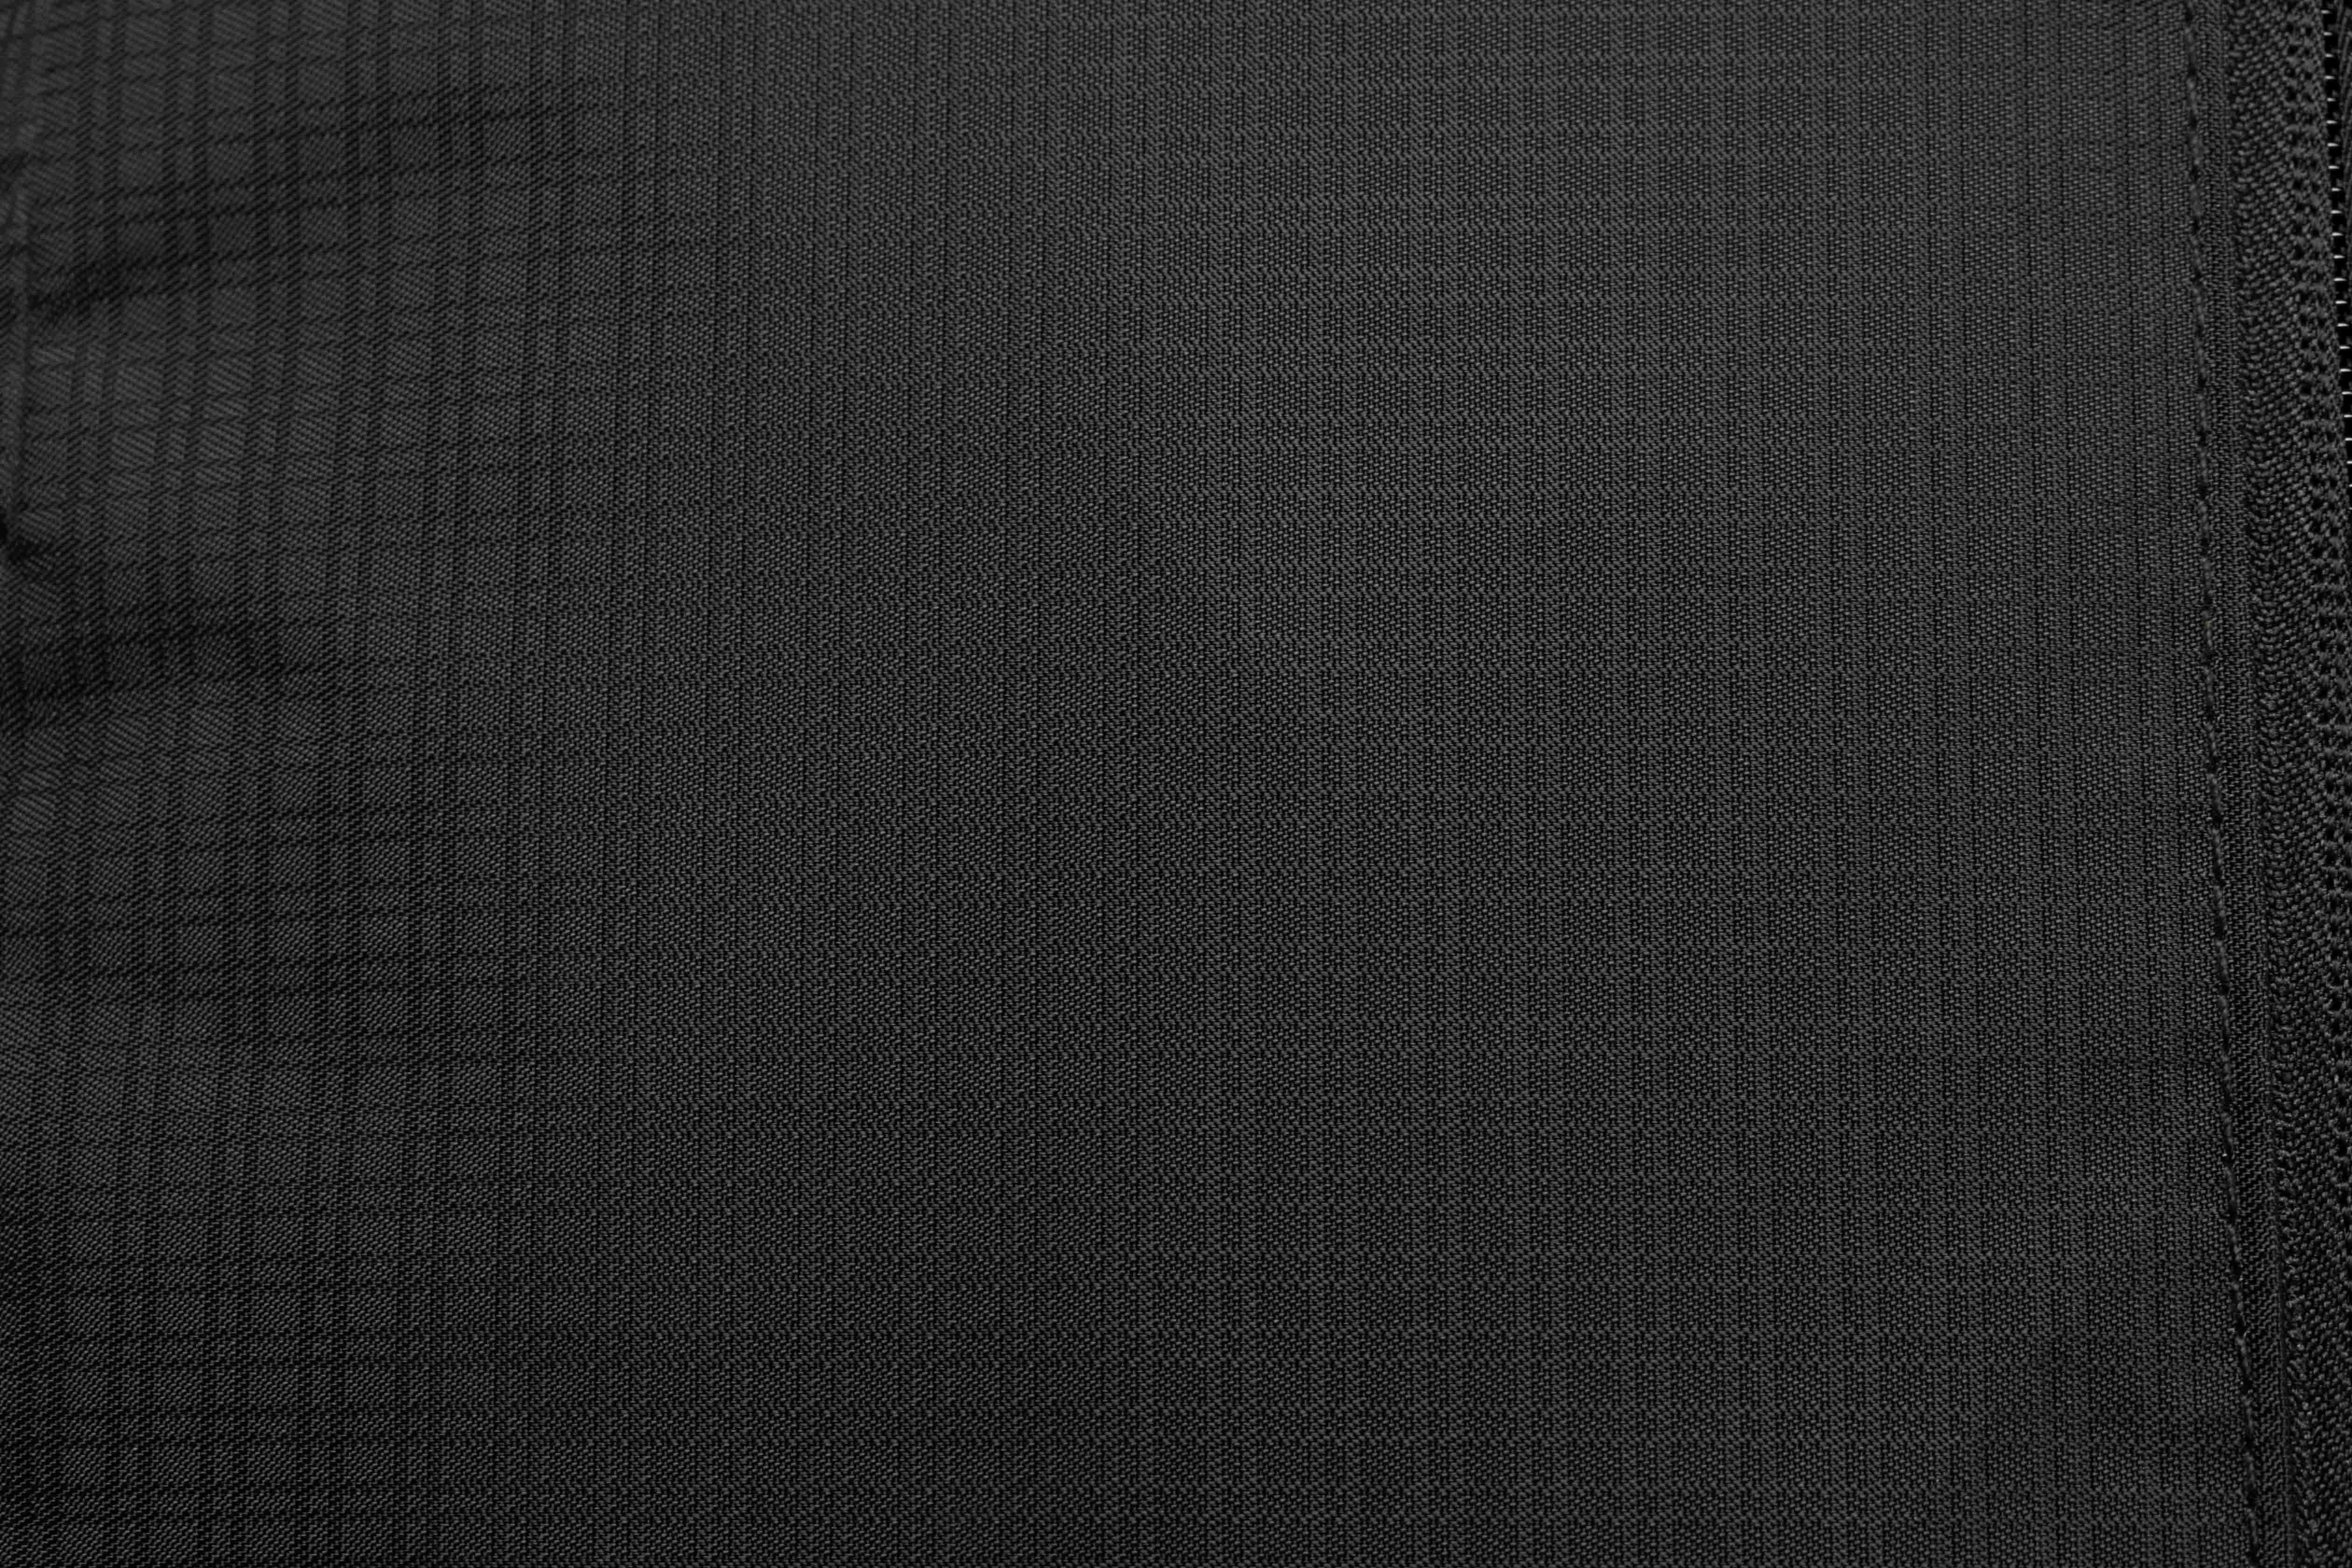 CTY-01 Fabric